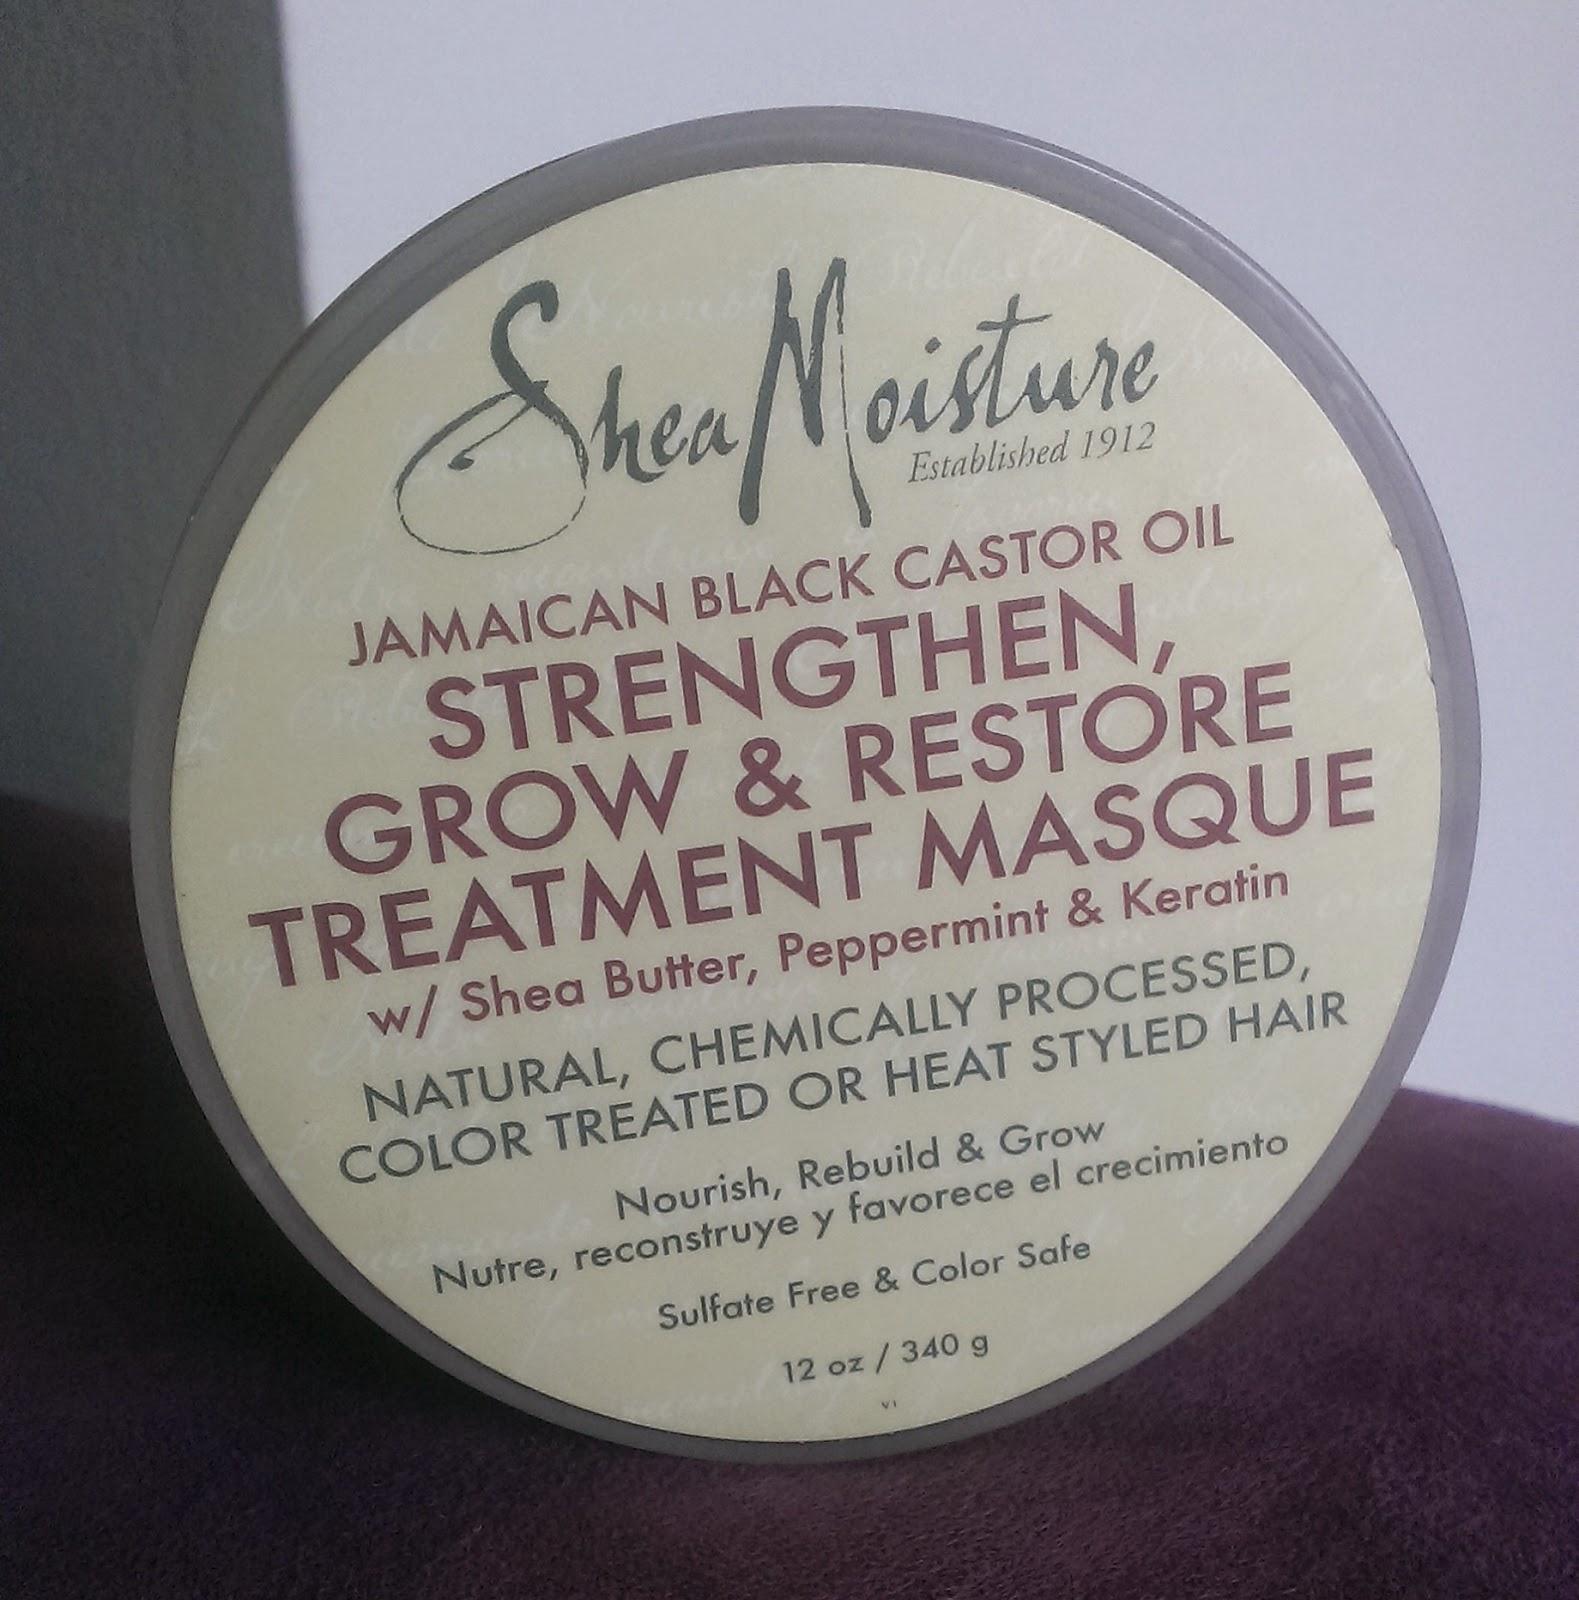 Shea Moisture Jamaican Black Castor Oil masque